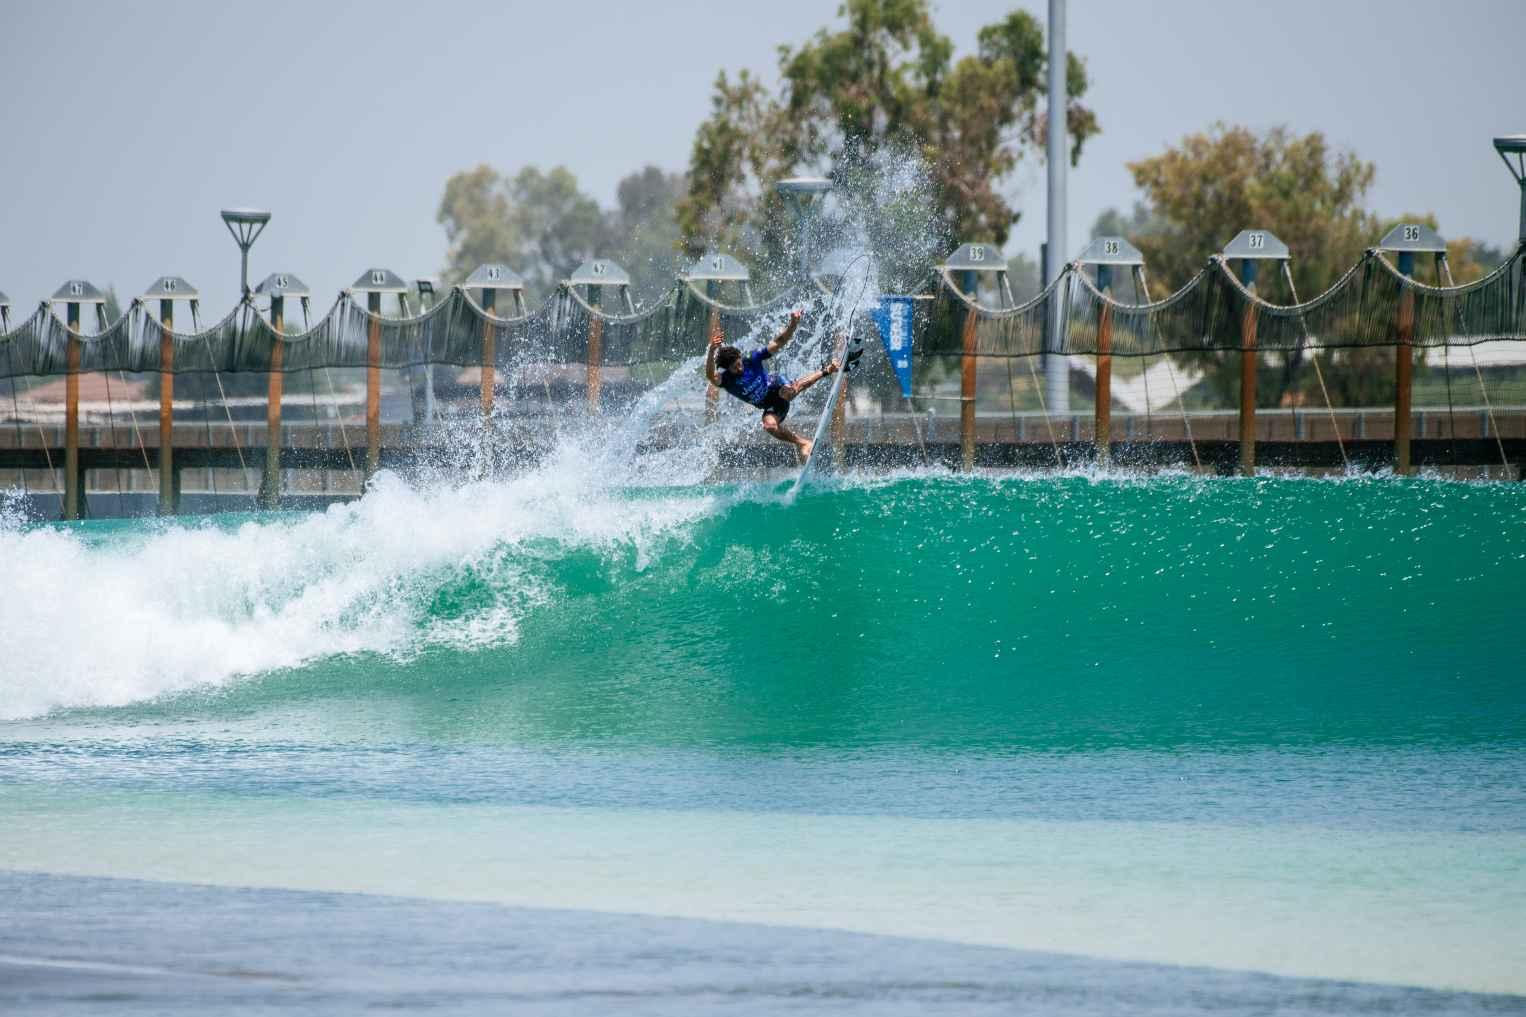 surf30 surf ranch pro 2021 wsl surf Dora Y Ranch21 PNN 2697 2